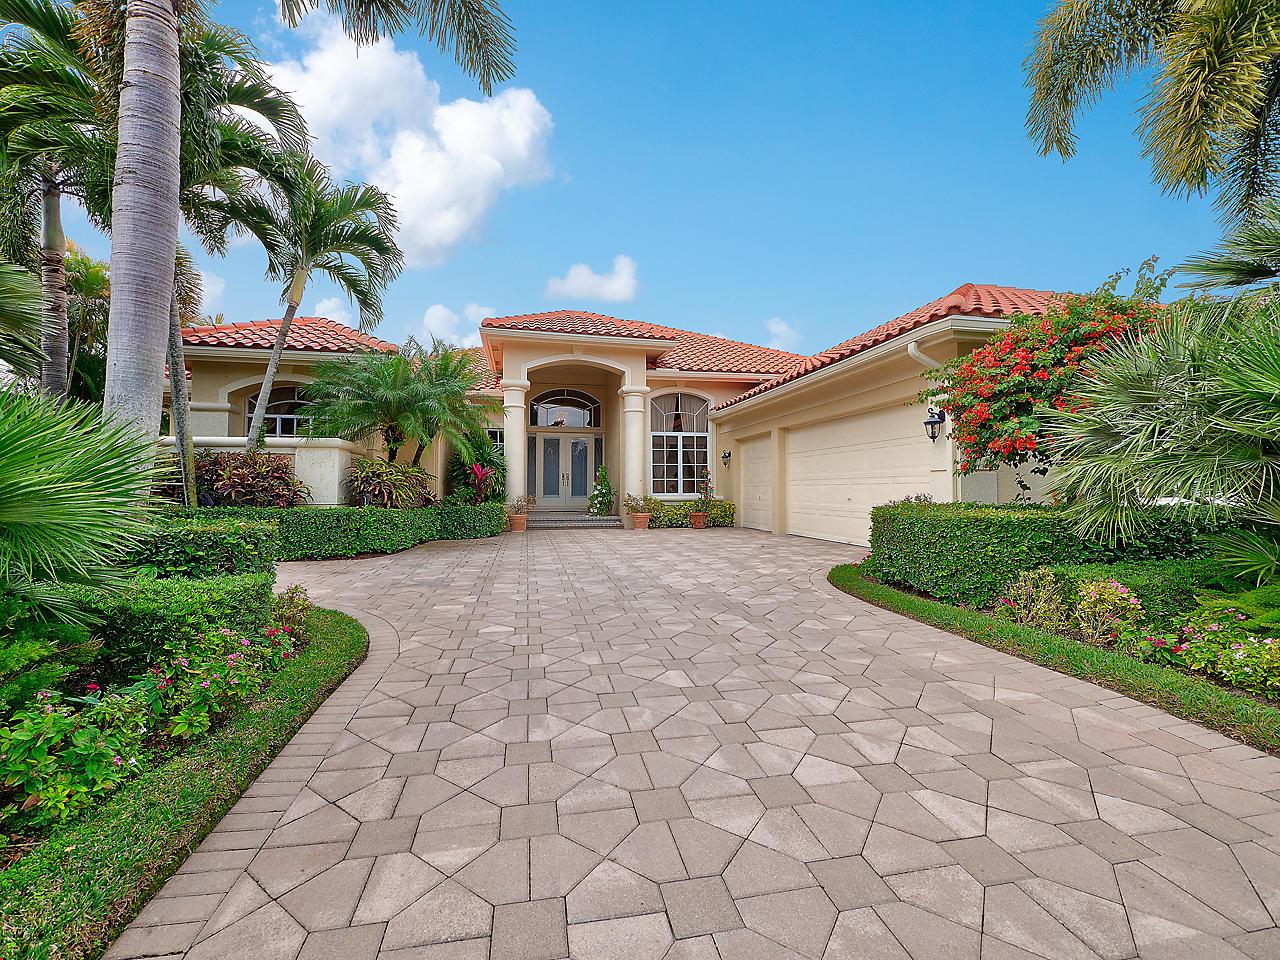 Photo of 1002 Grand Isle Way, Palm Beach Gardens, FL 33418